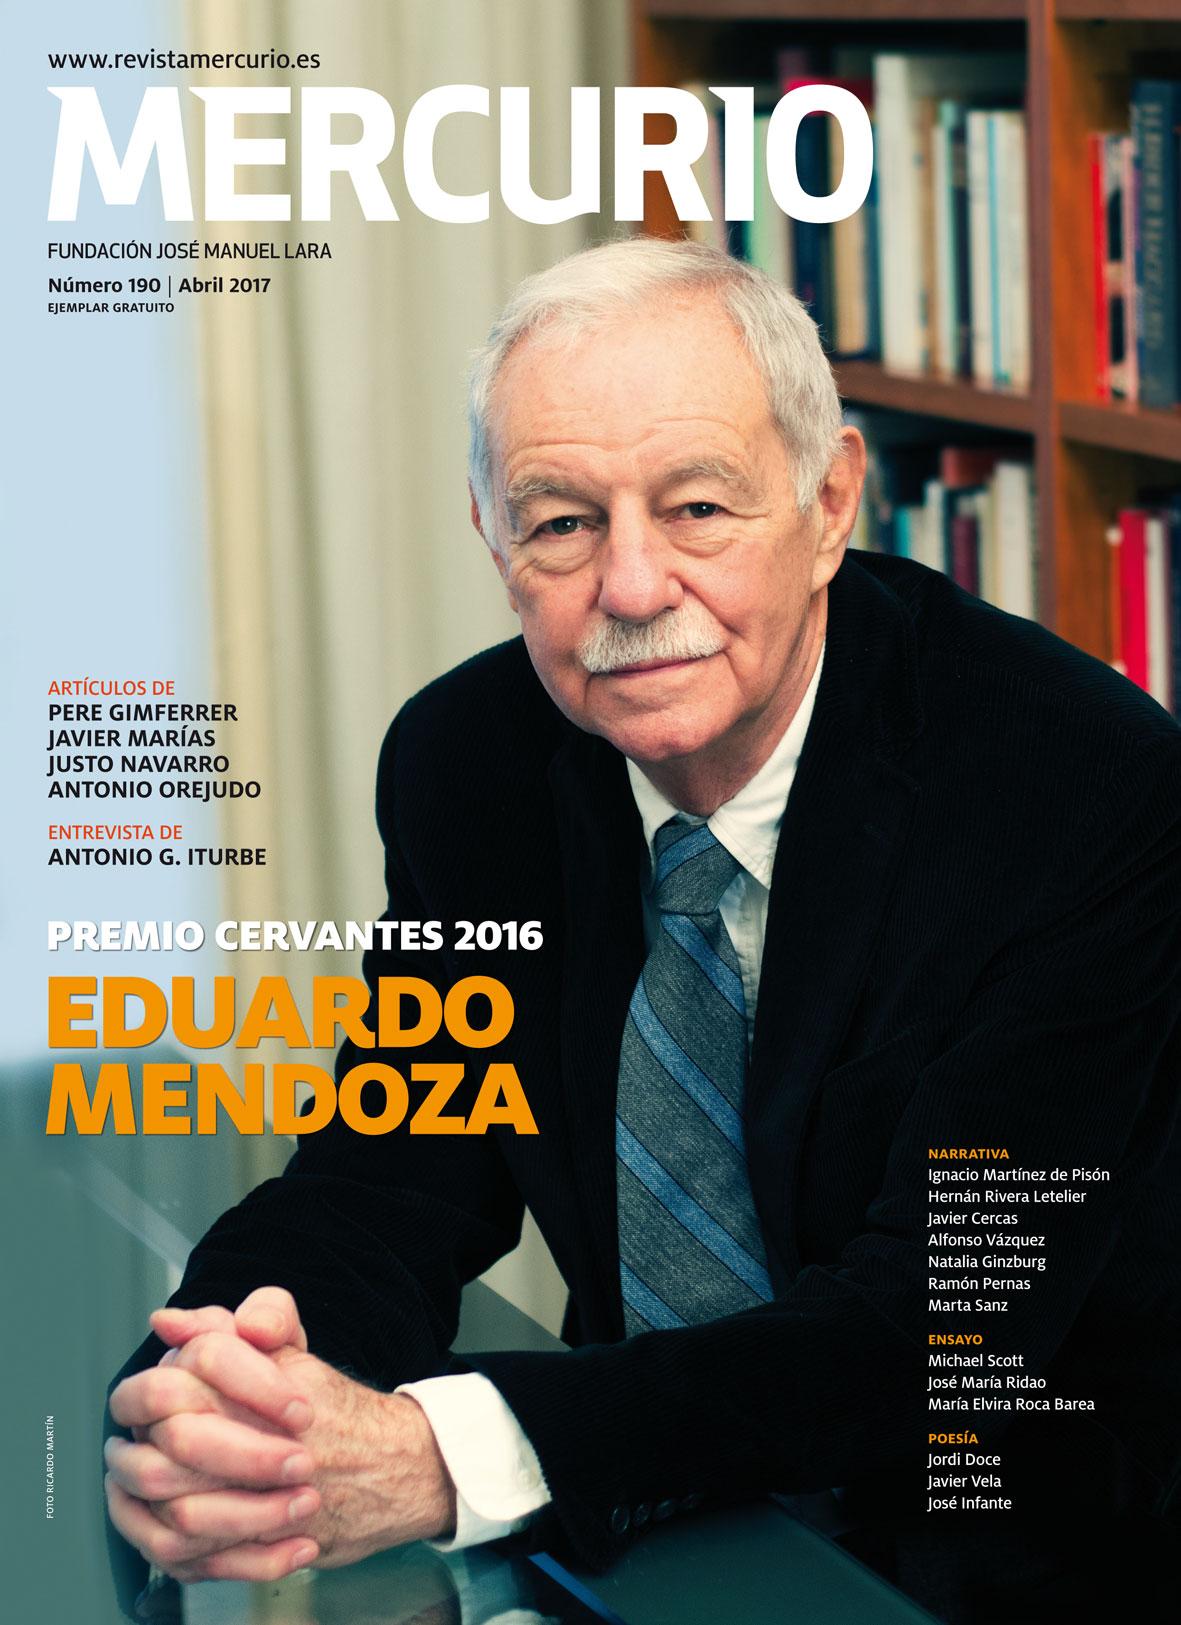 Mercurio 190. Abril 2017. Foto Ricardo Martín